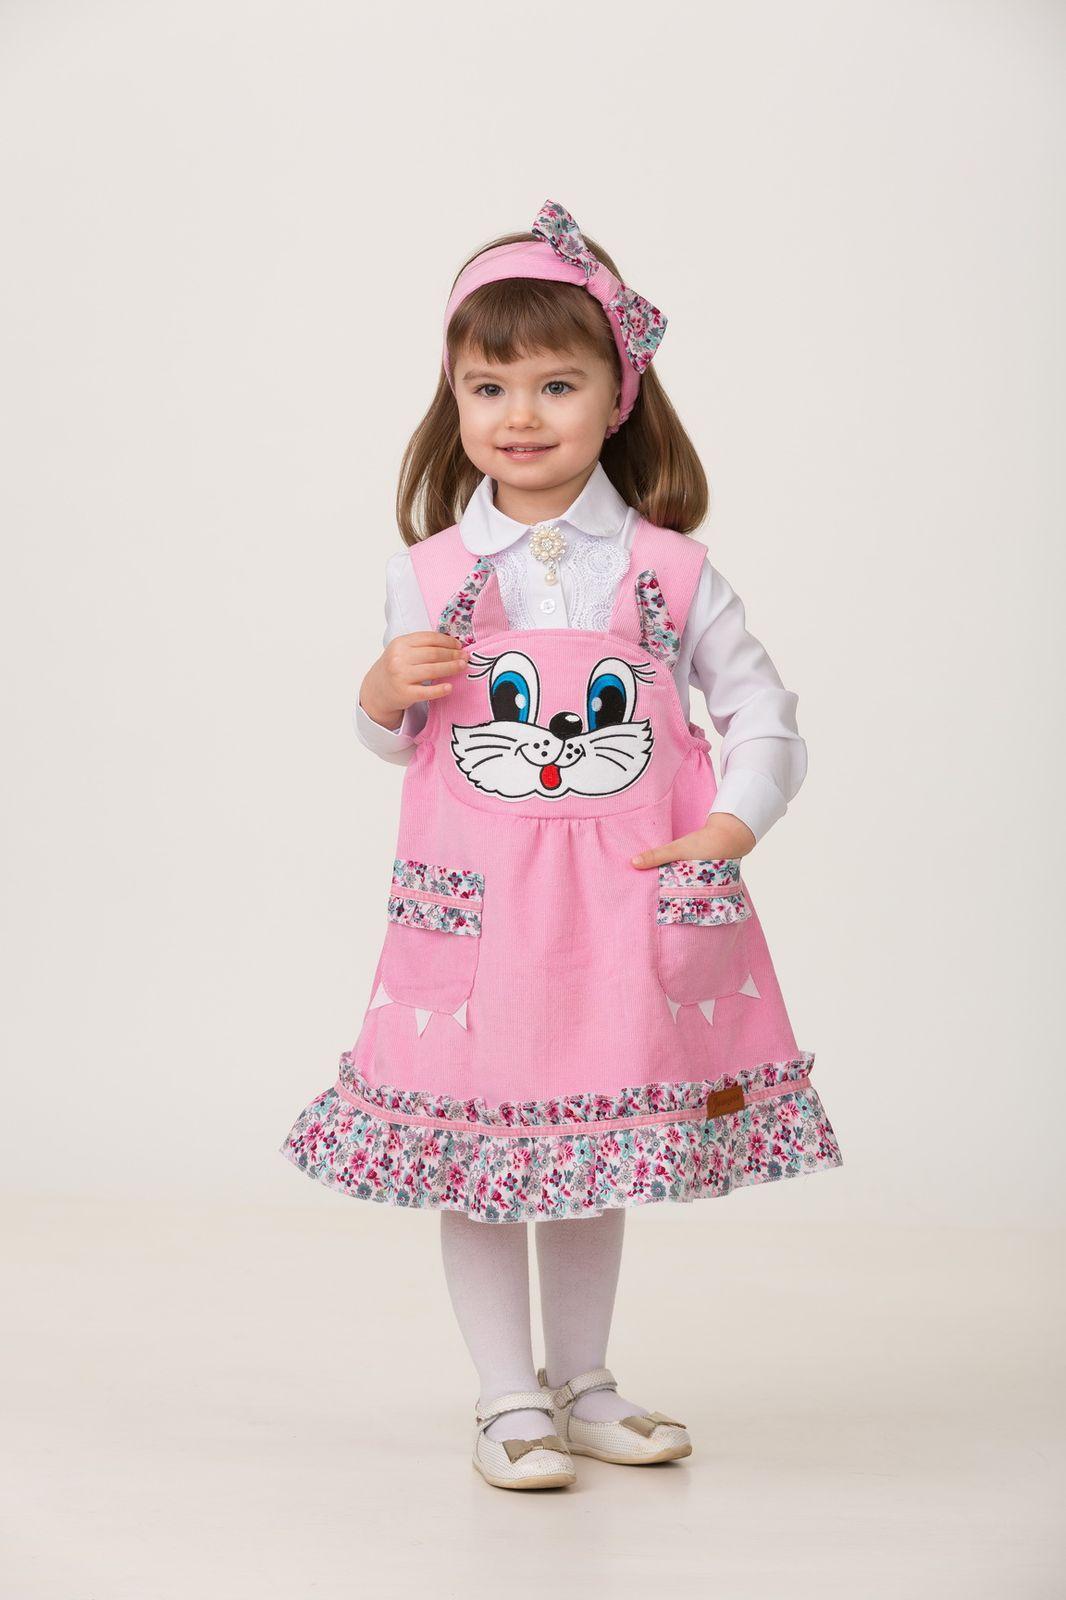 Карнавальный костюм Jeanees Кошечка Царапка, цвет: розовый. Размер: 30 карнавальный костюм jeanees зайчонок хвастунишка цвет голубой размер 30